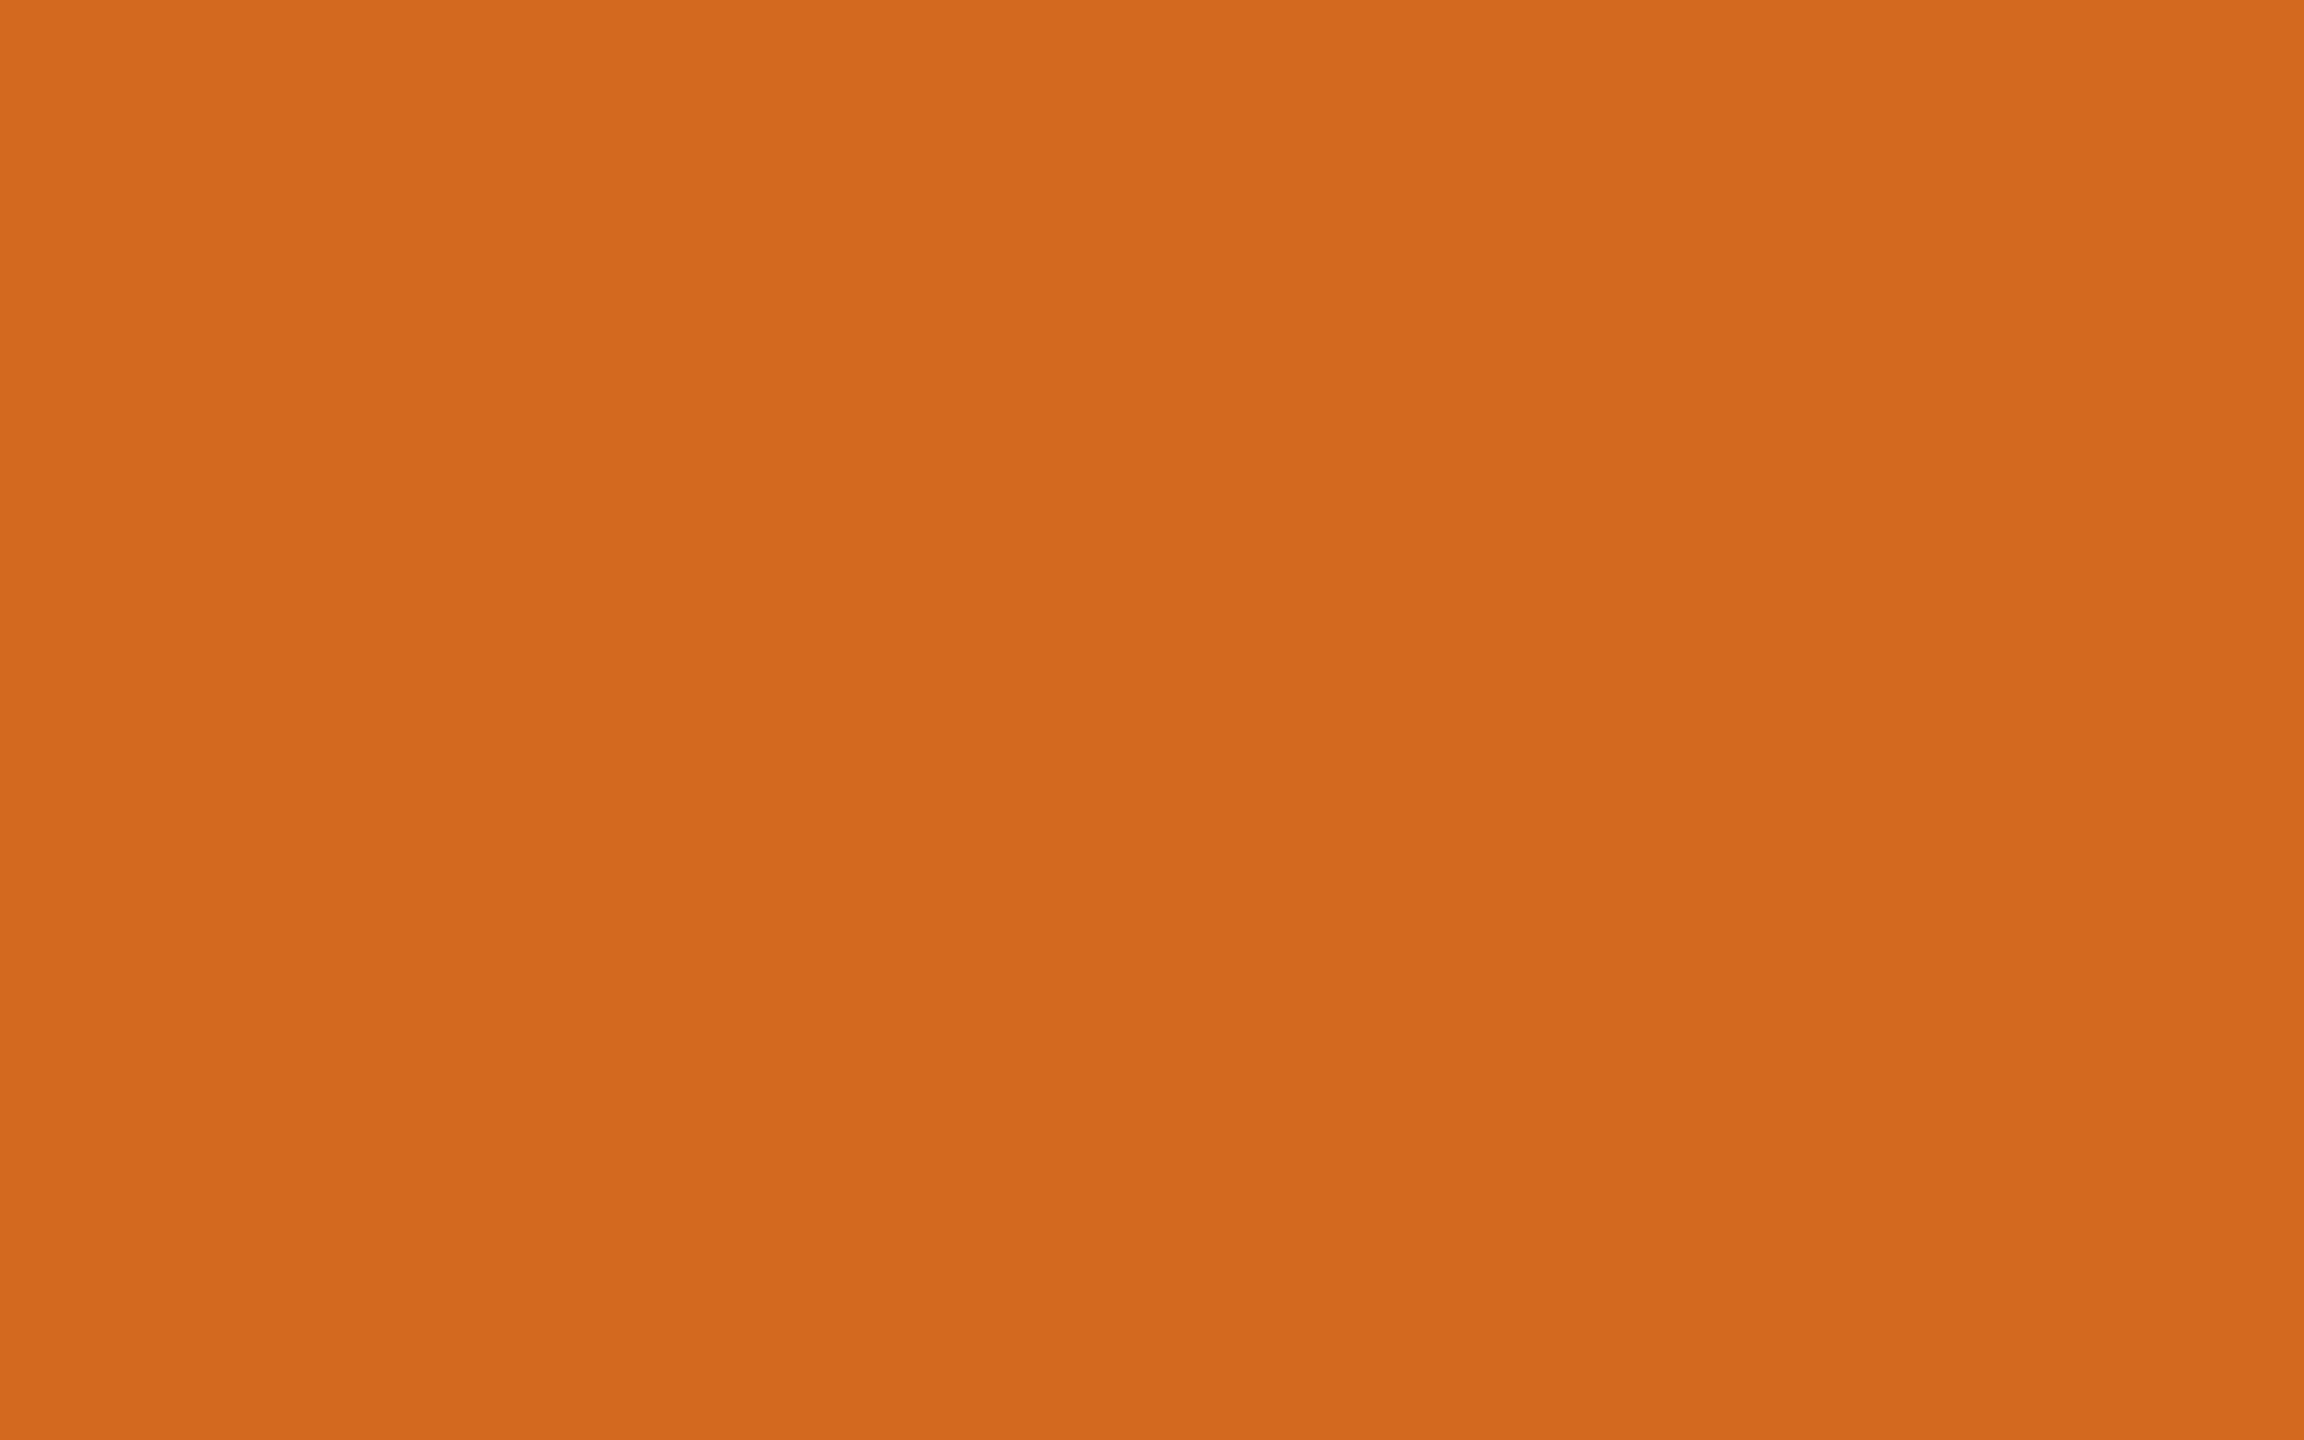 2304x1440 Cinnamon Solid Color Background